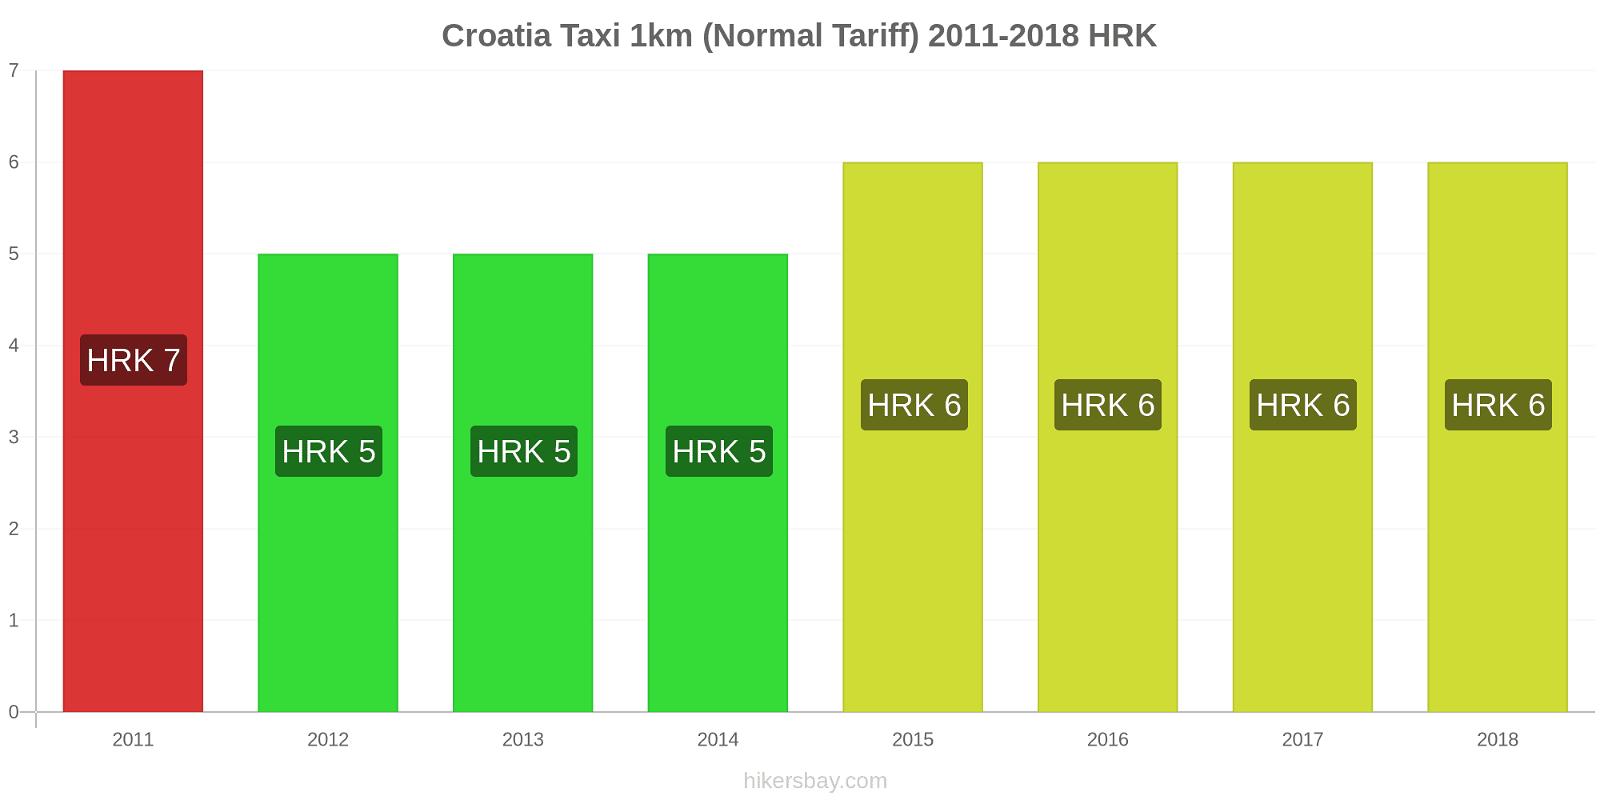 Croatia price changes Taxi 1km (Normal Tariff) hikersbay.com